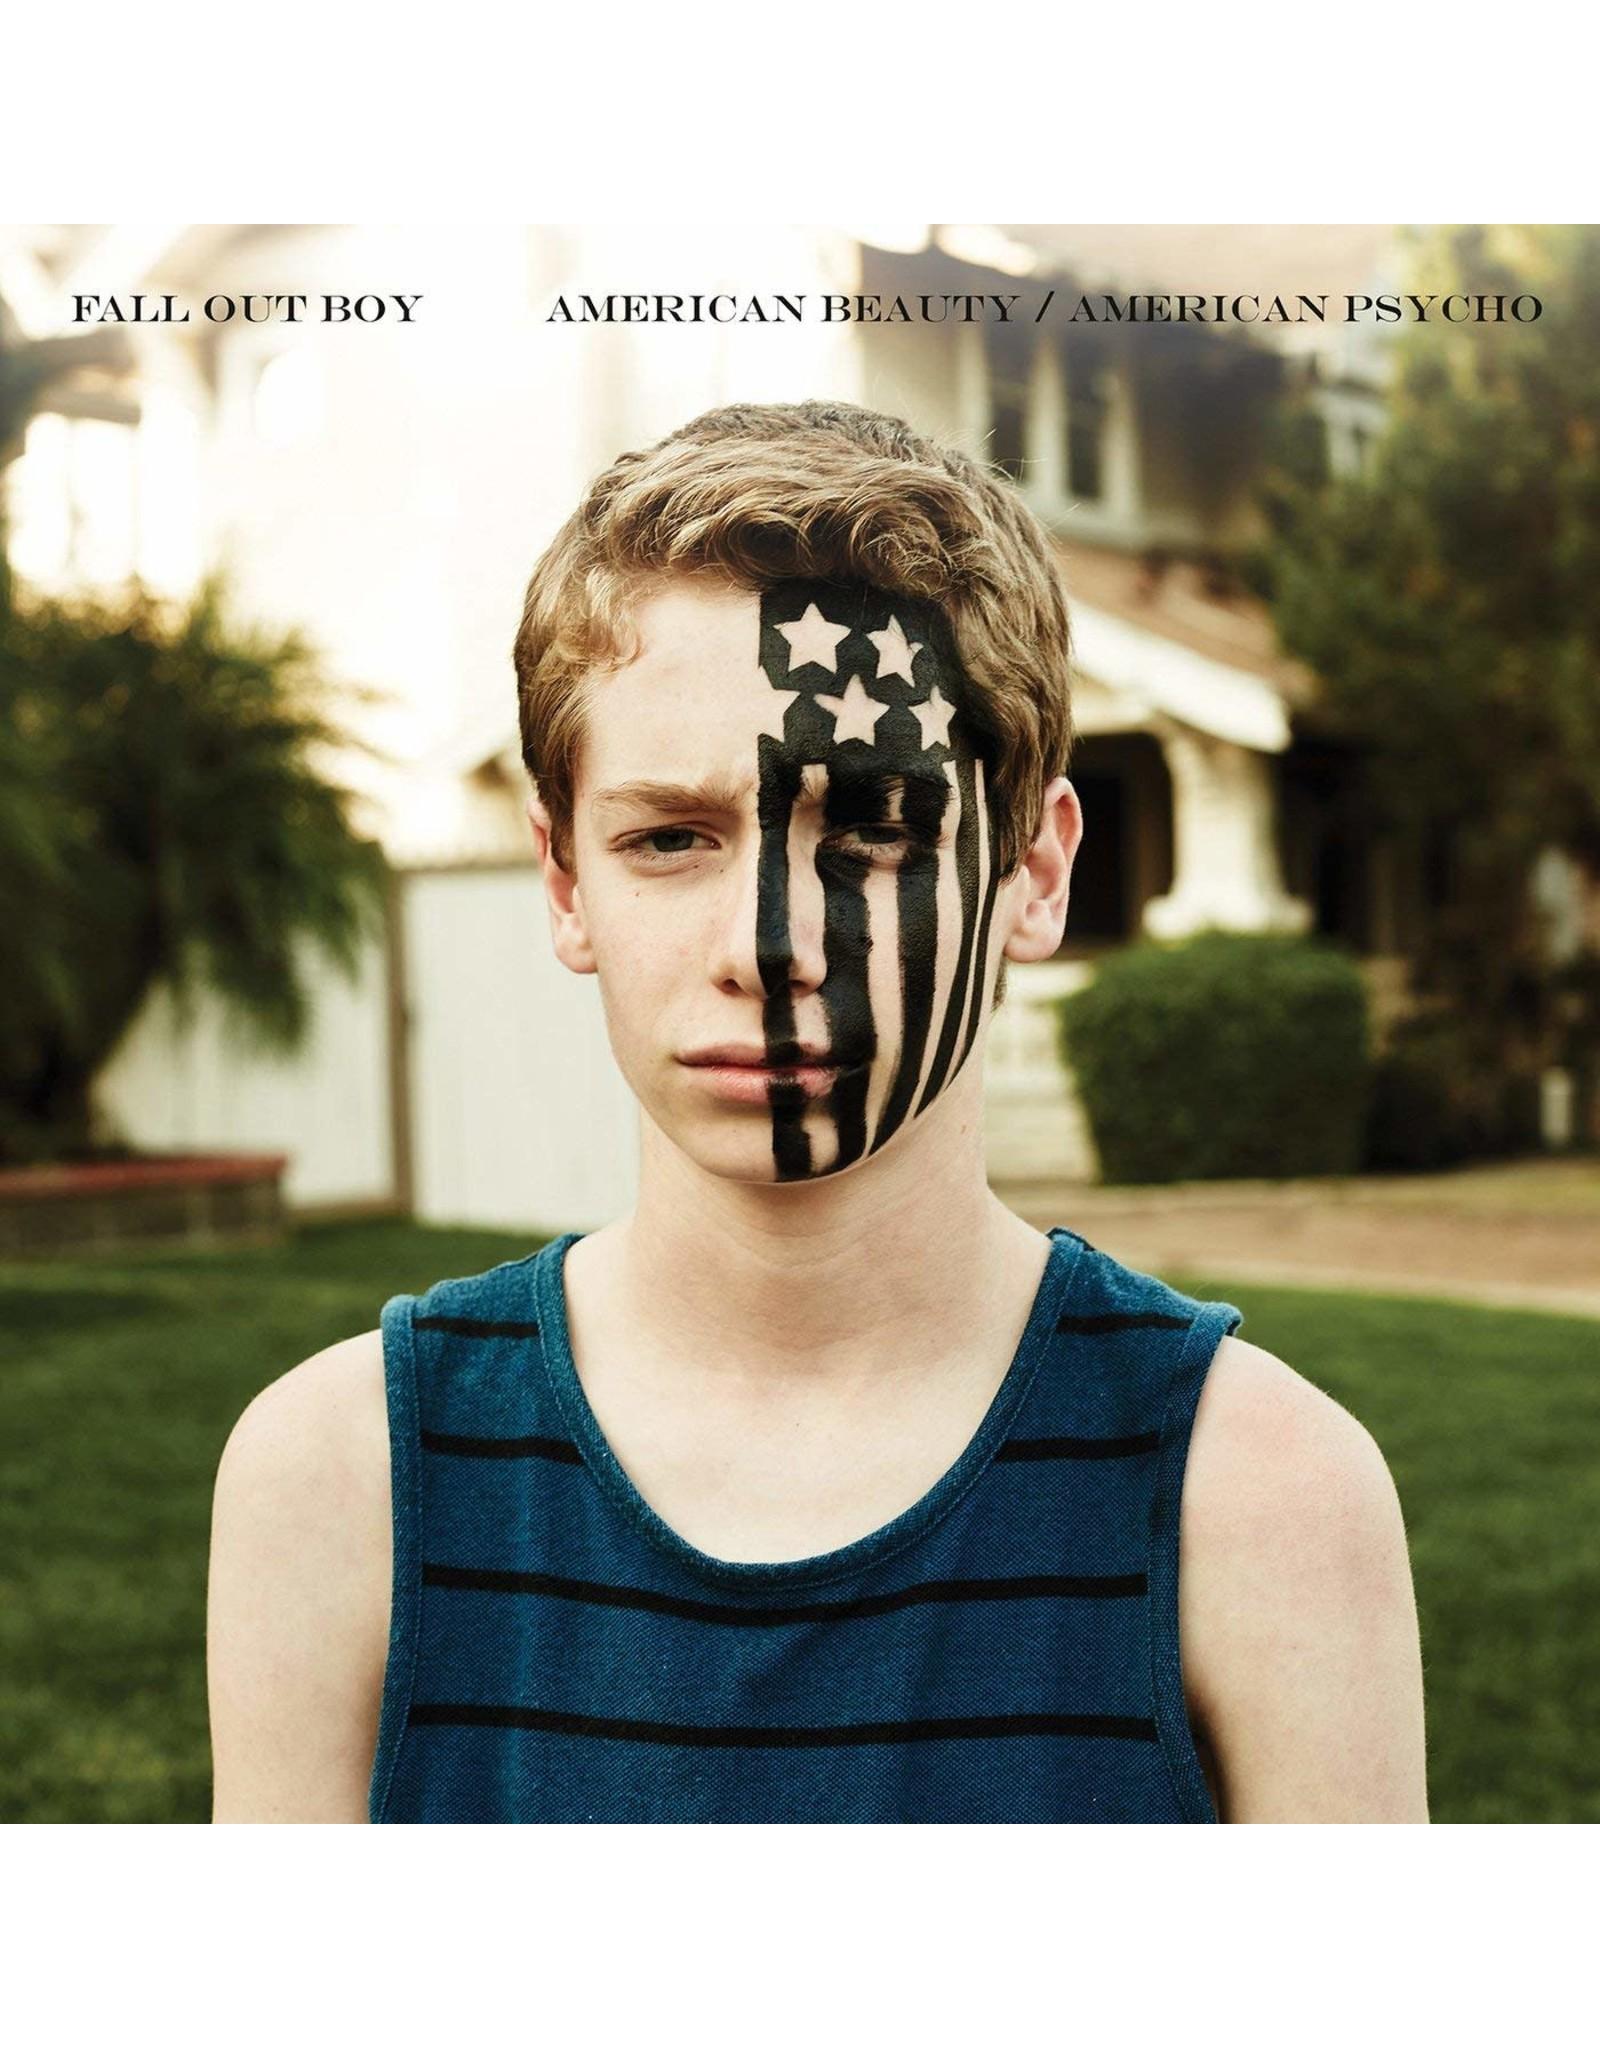 Fall Out Boy - American Beauty/ American Psycho